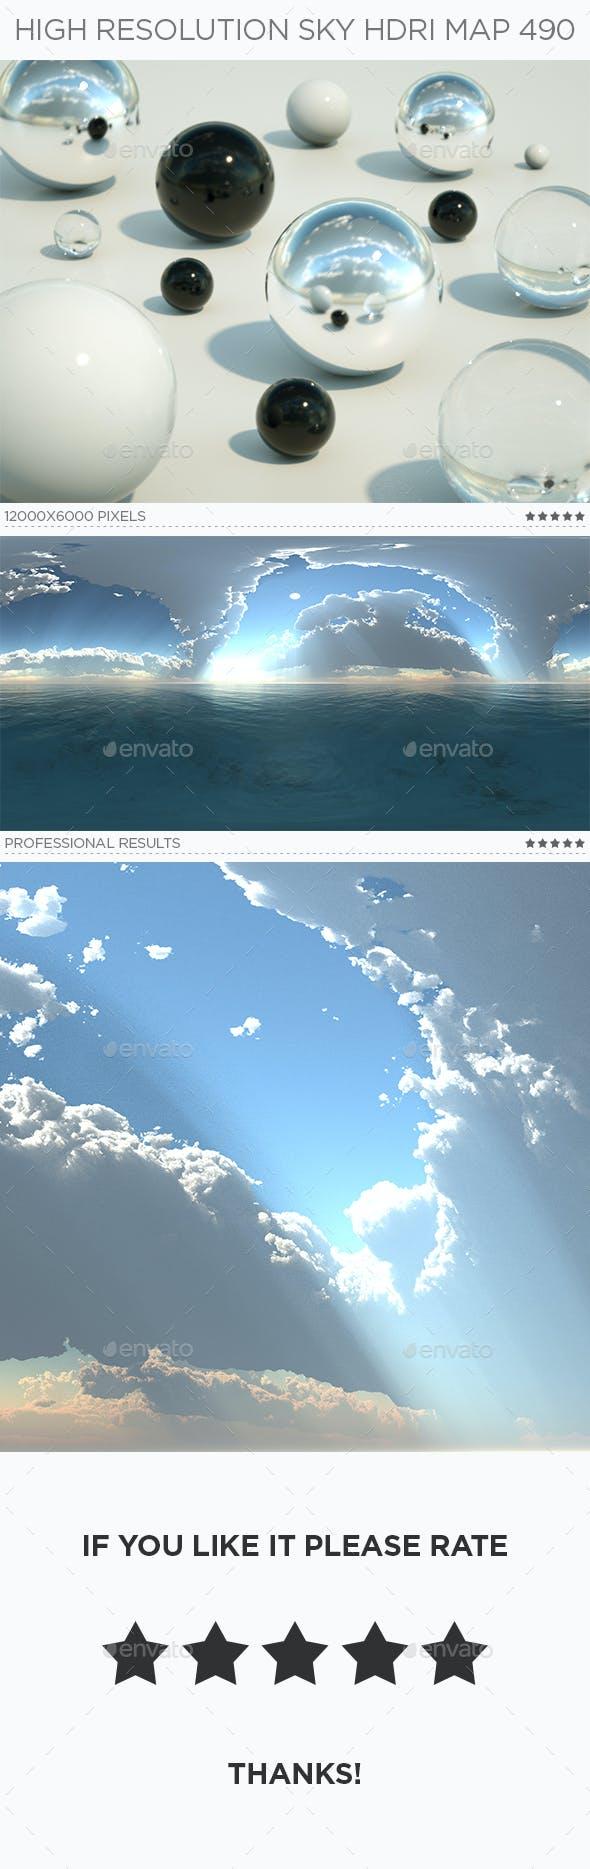 High Resolution Sky HDRi Map 490 - 3DOcean Item for Sale